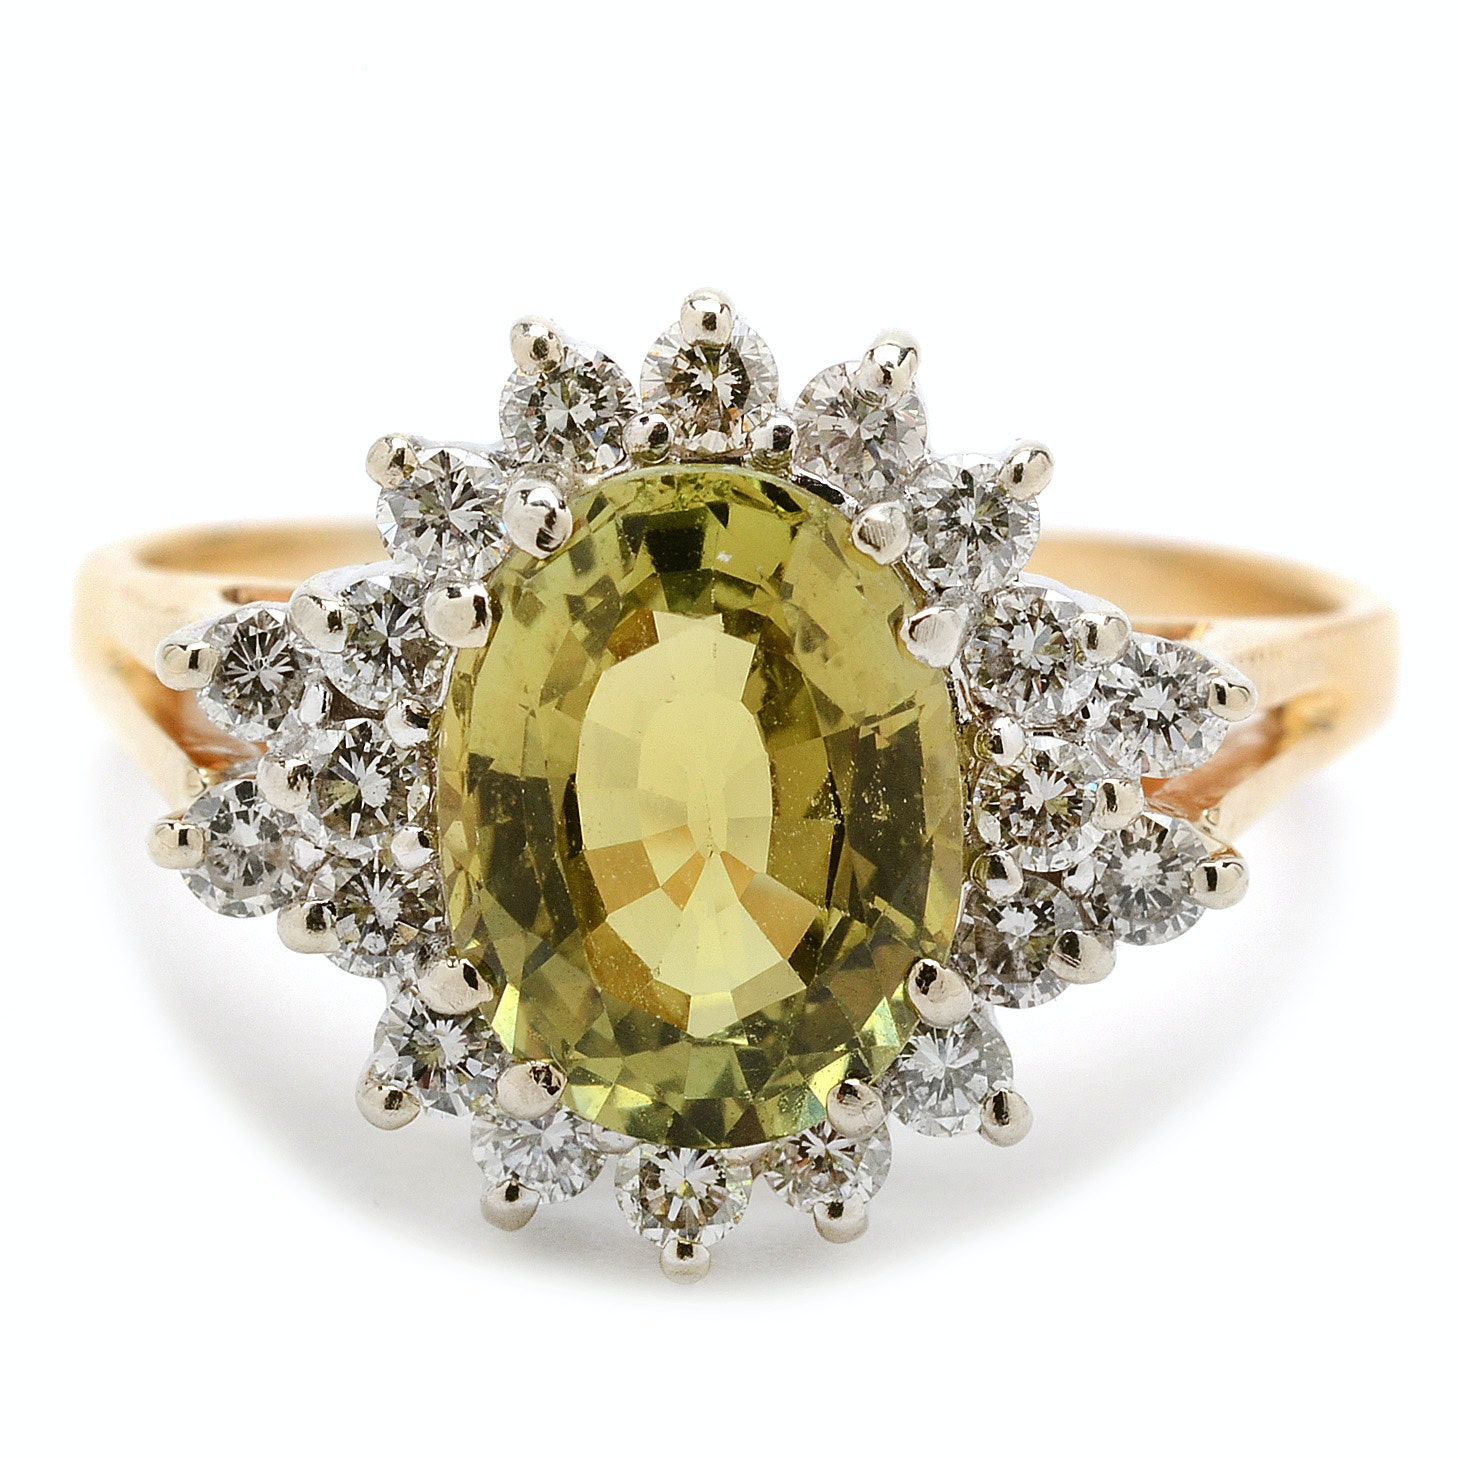 14K Yellow Gold Green Chrysoberyl Diamond Cocktail Ring